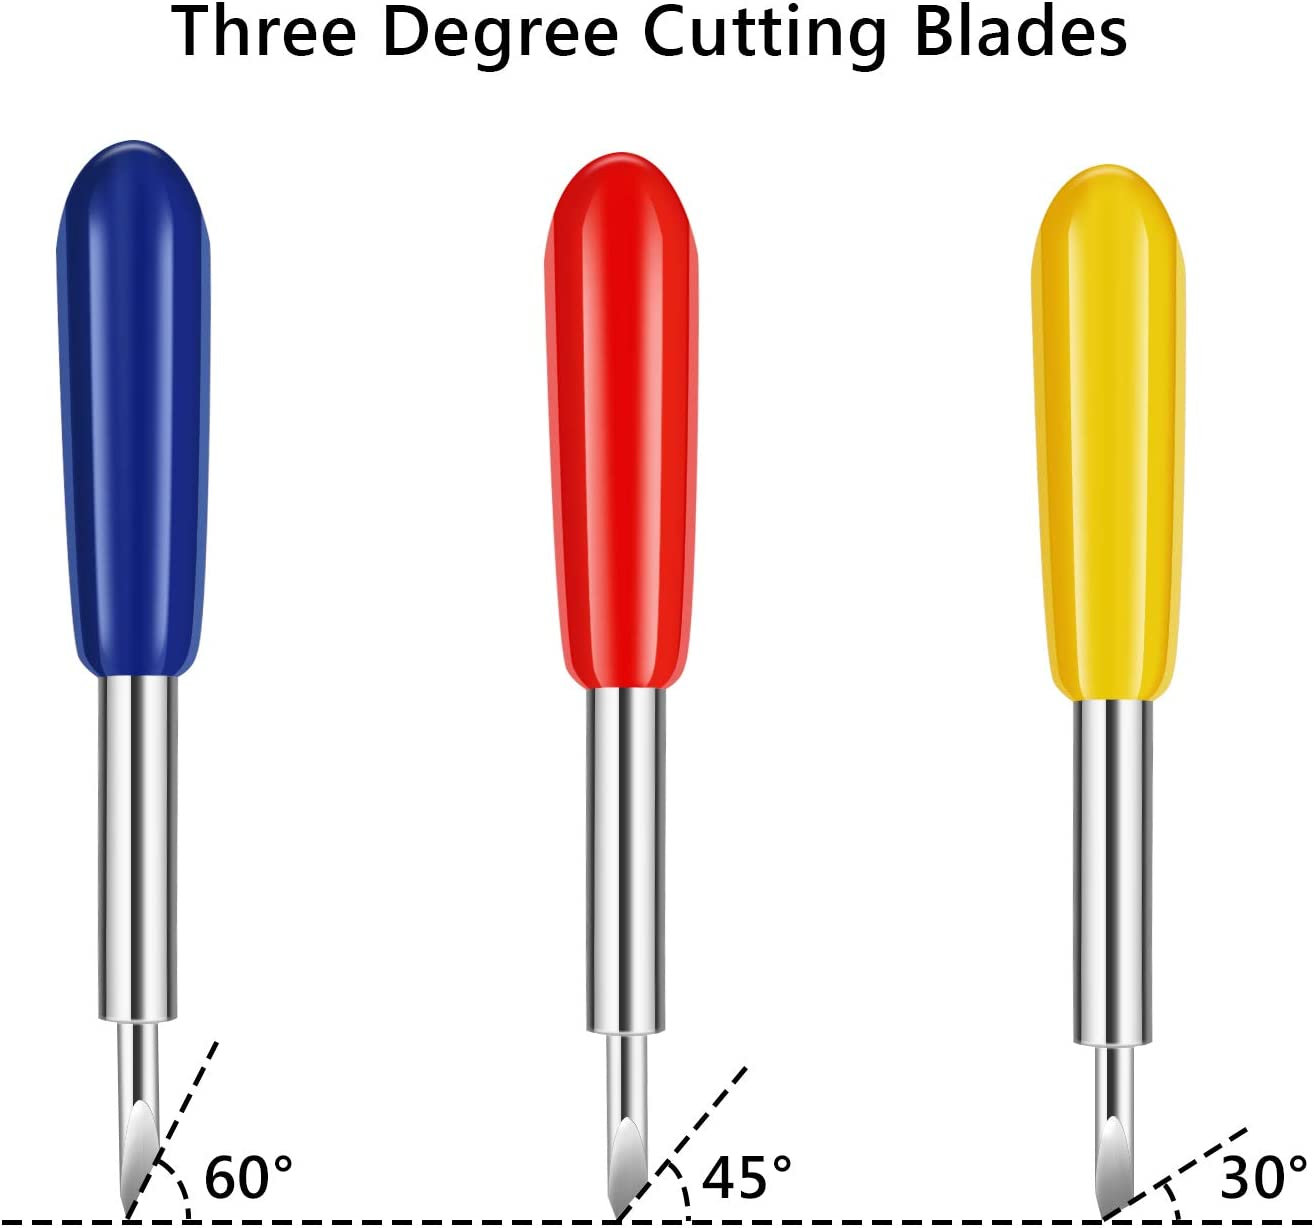 Vinyl Cutting Blades Enpoint 30 PCS Cutting Blades for Cricut Explore Air//Air 2 Maker Expression 30//40//60 Degree Cutting Plotter Blade Deep Cut Vinyl Fabric Cutting Replacement Blades